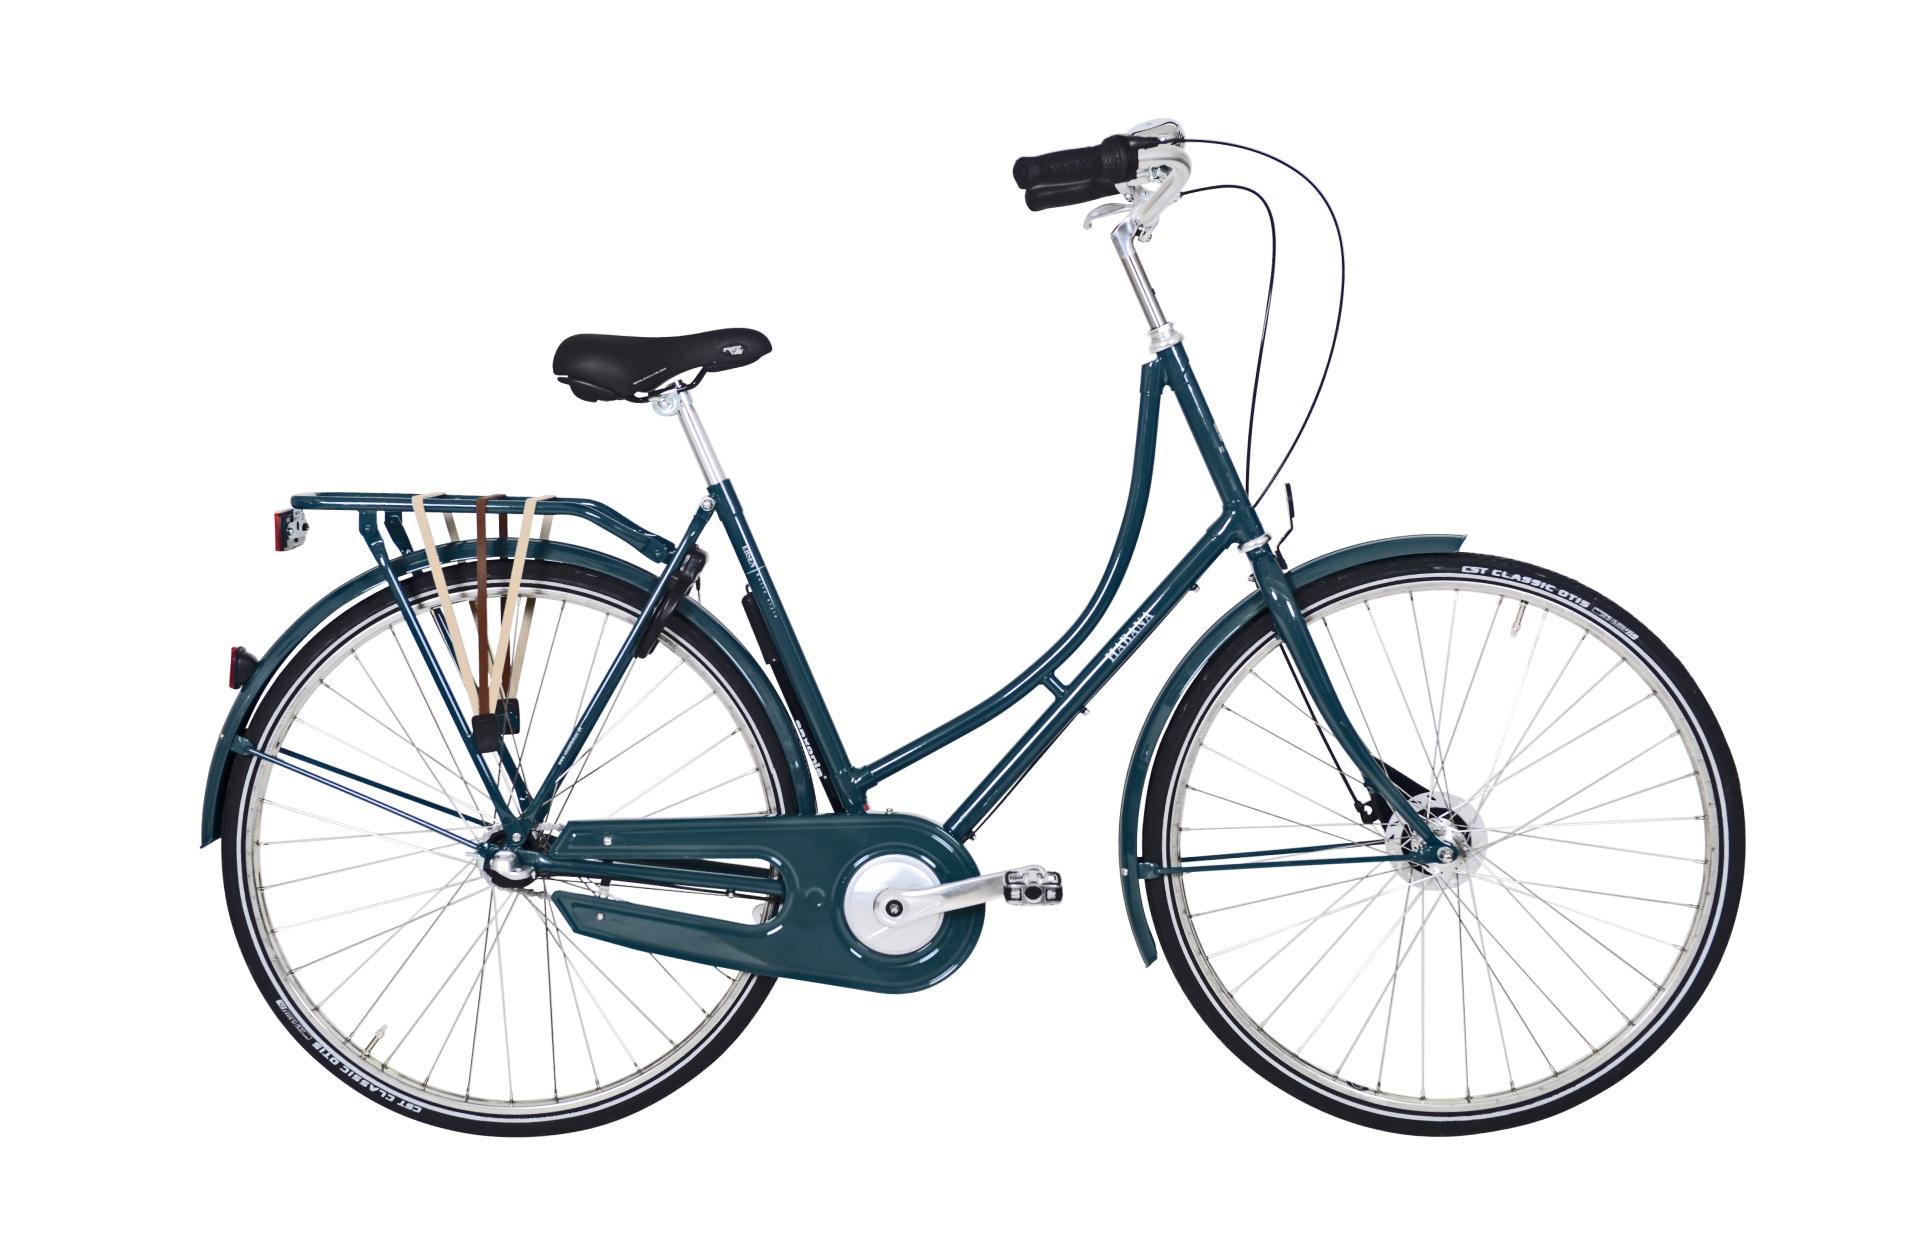 Pedalatleten Ebsen Habana Dame 3 Gear Turkis 55Cm - 2019 Cykler